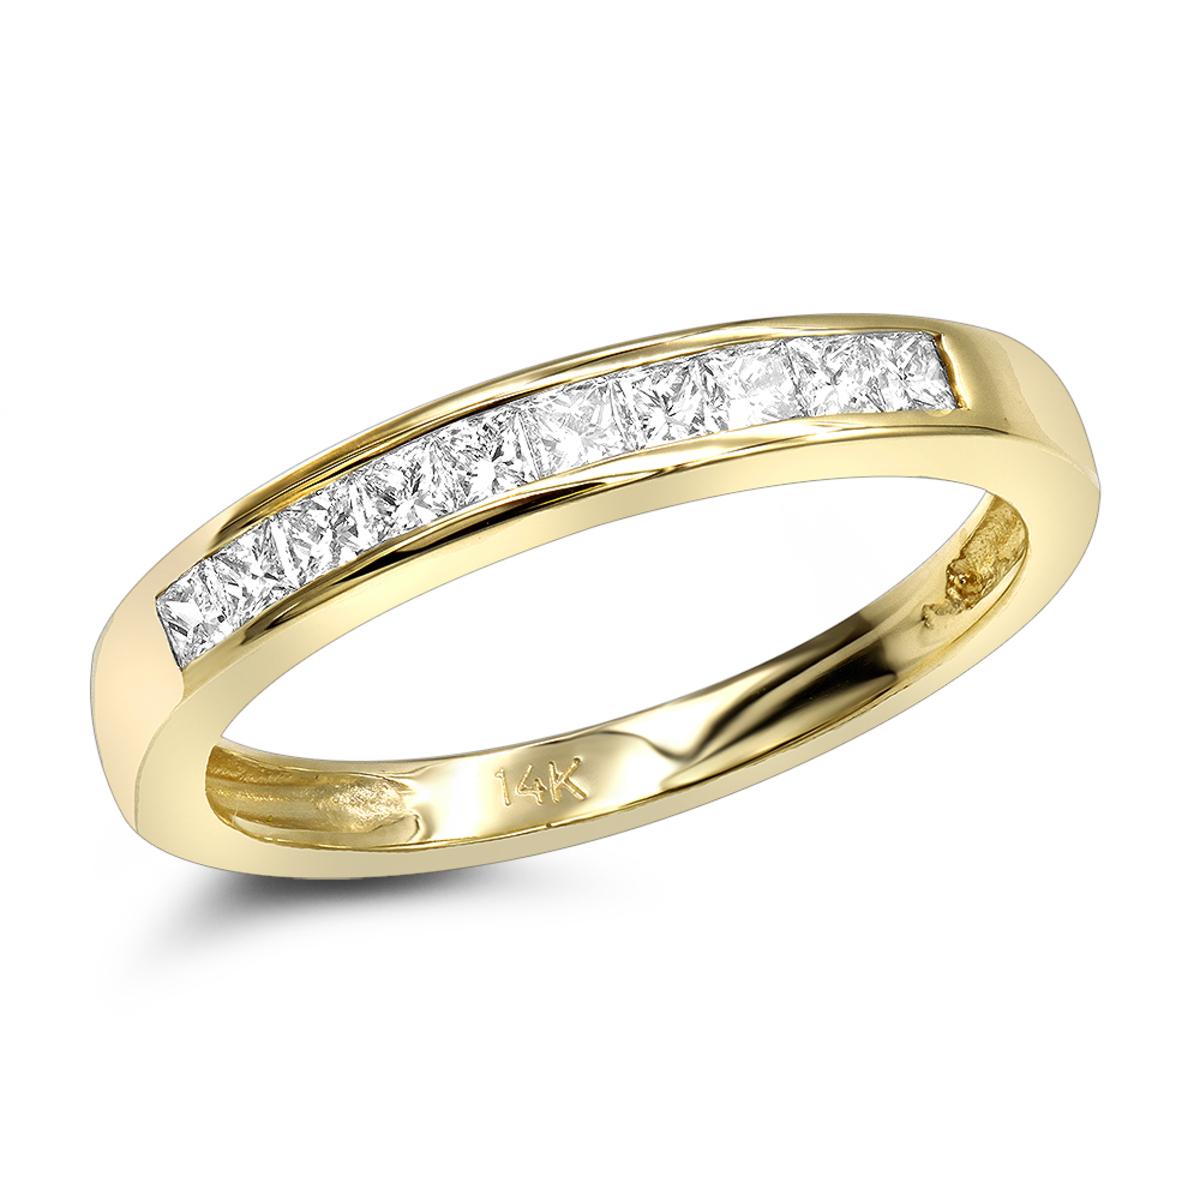 Thin 14K Gold Princess Cut Diamond Wedding Ring Ladies Band 0.33ct